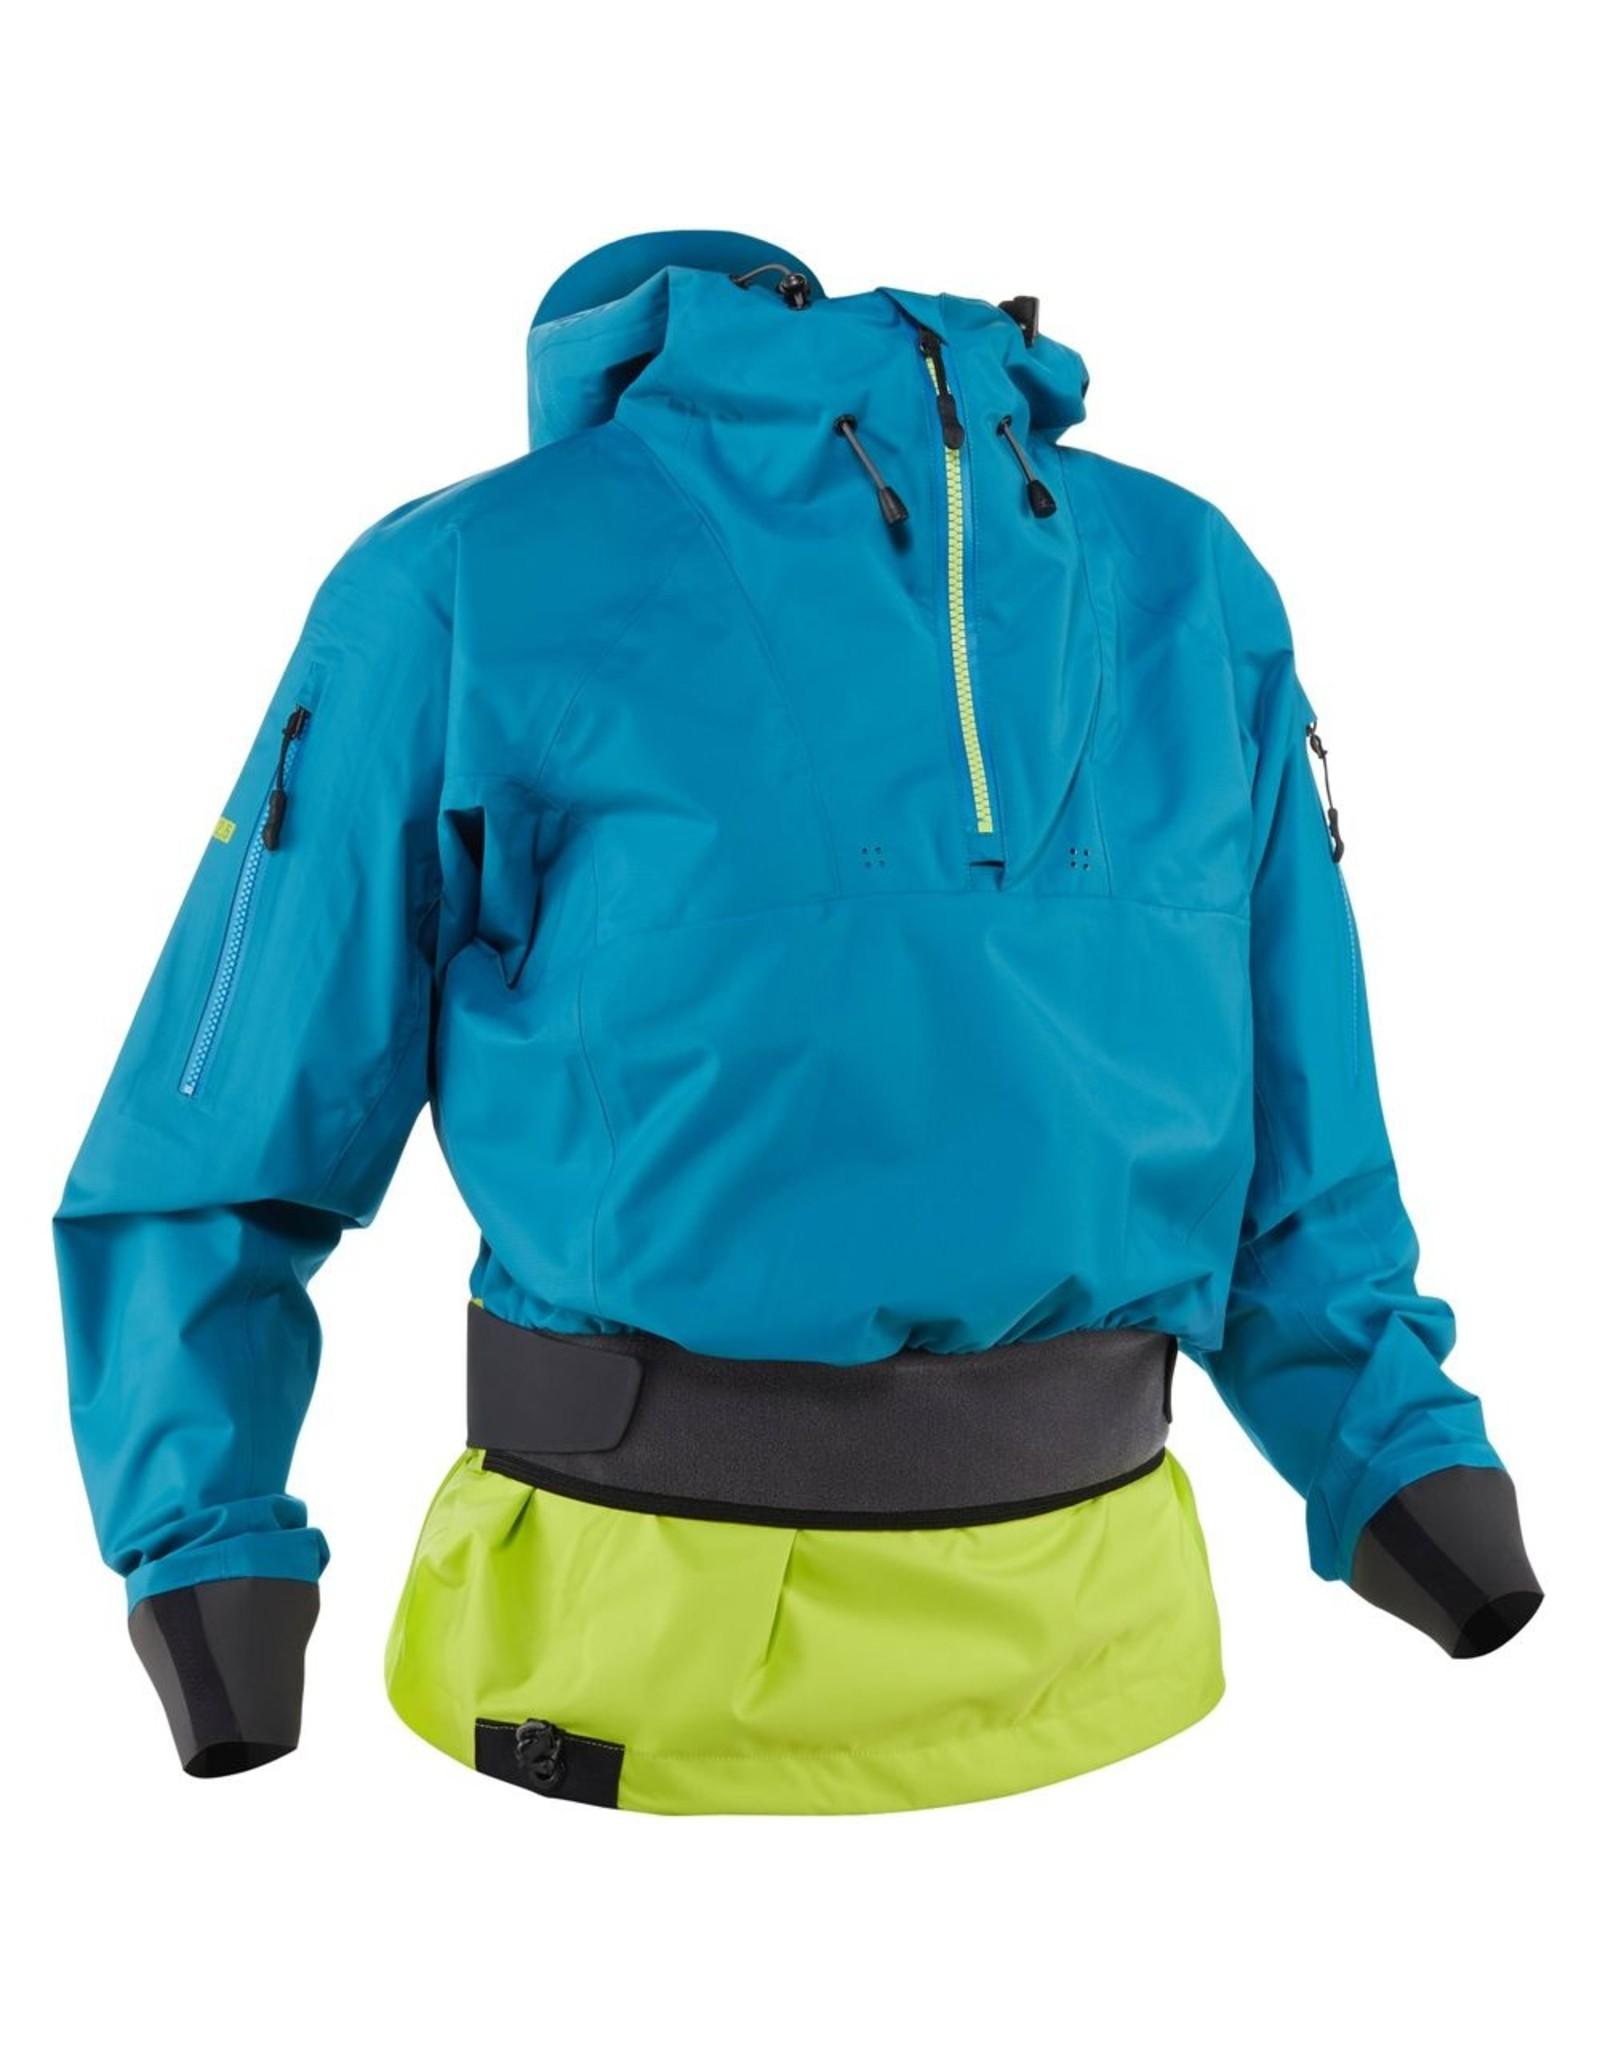 NRS NRS Women's Riptide Splash Jacket